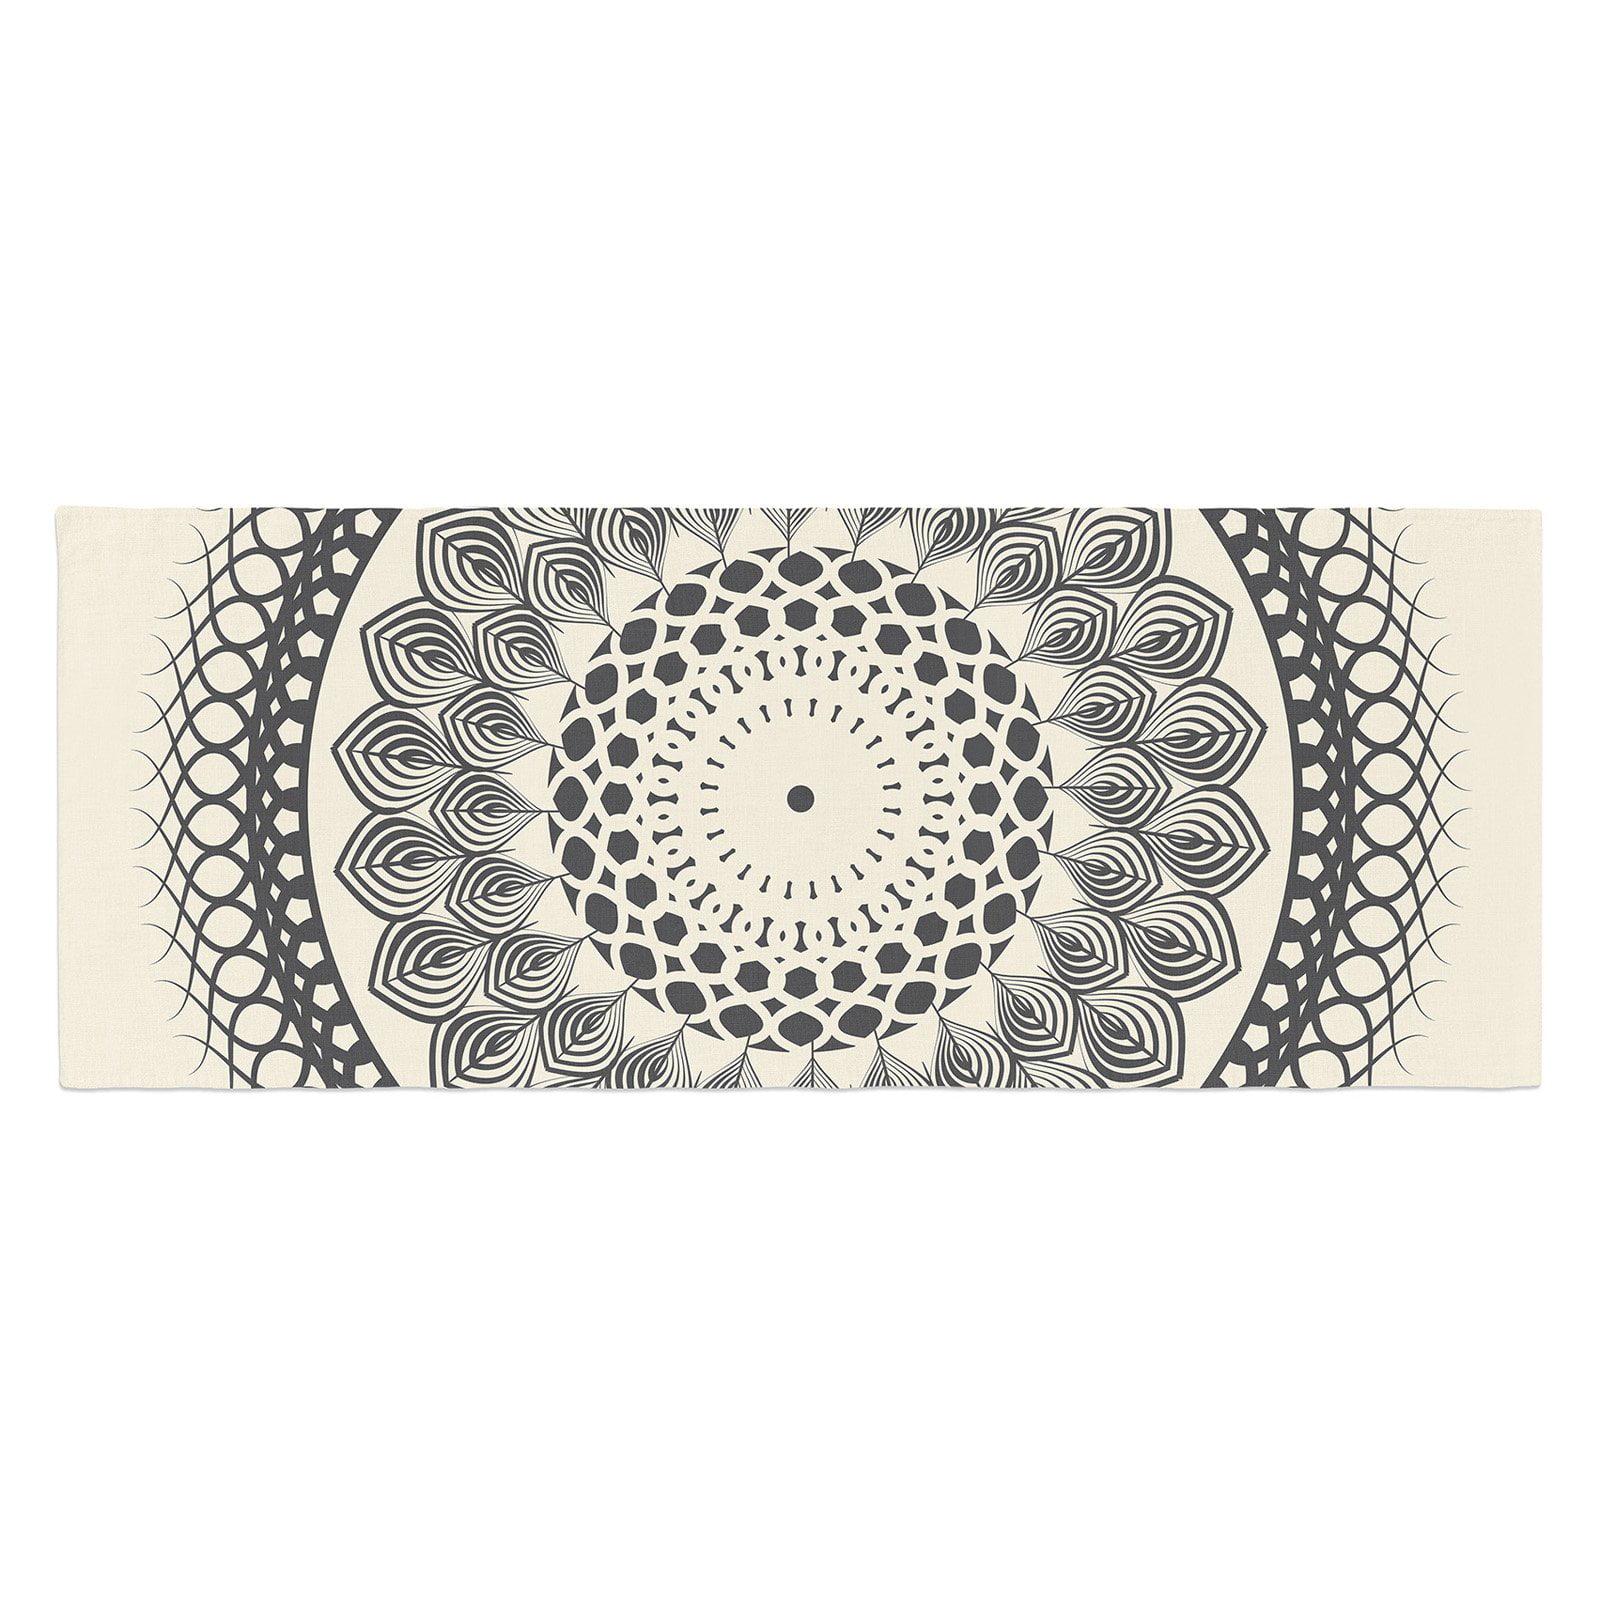 Famenxt and Boho Mandala Geometric Bed Runner by Kess InHouse